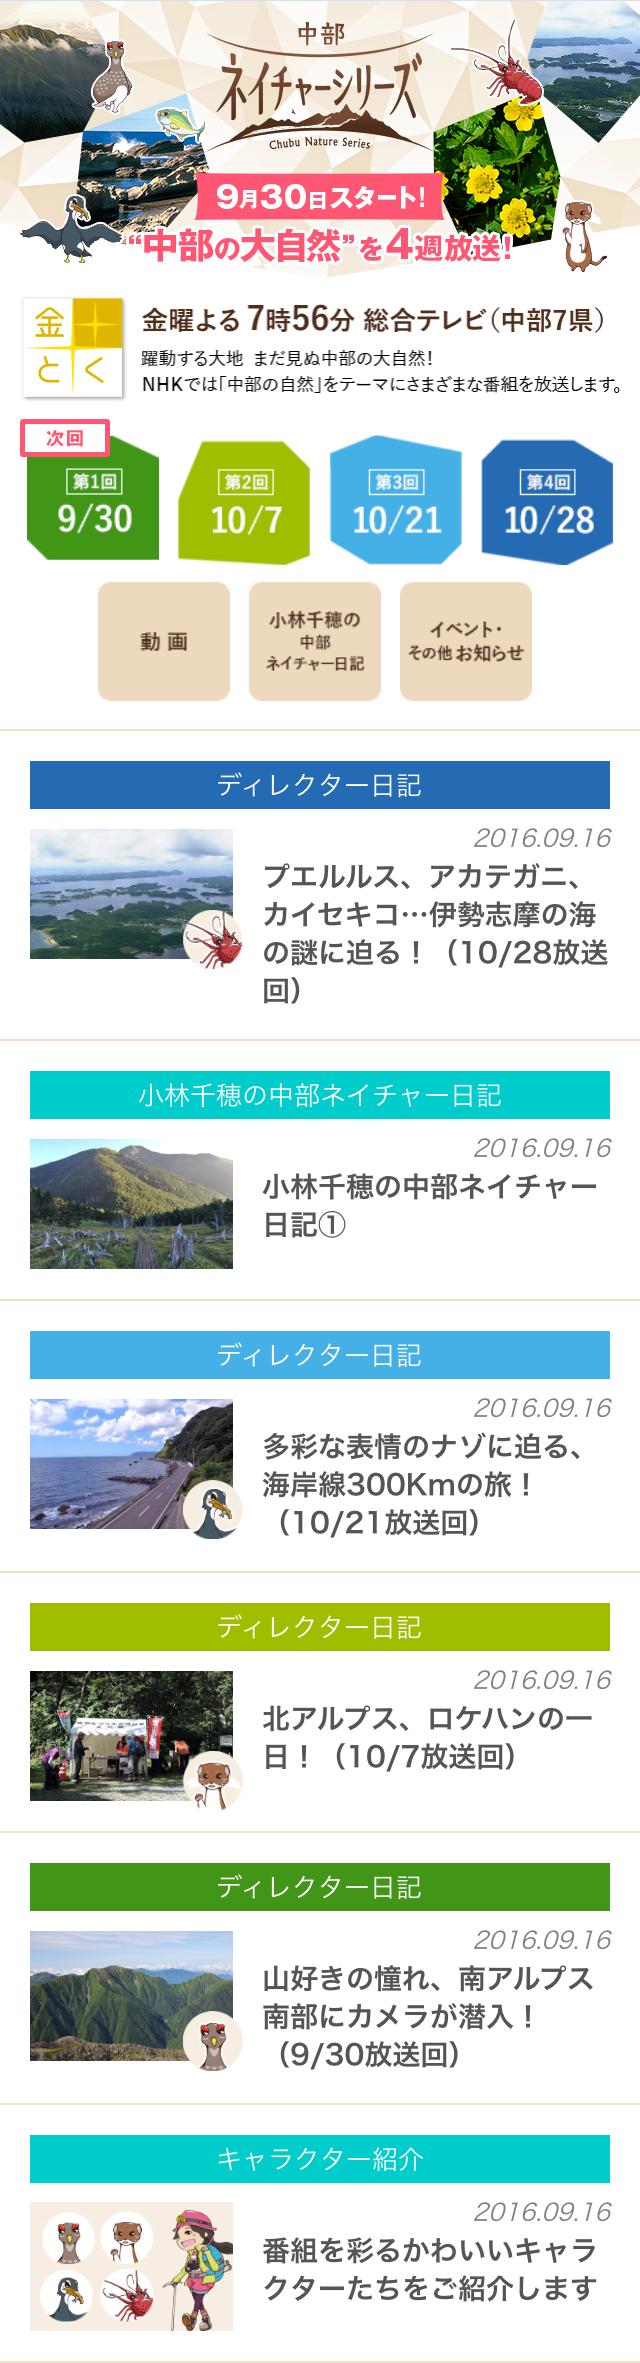 NHK 中部ネイチャーシリーズ(2016) スマホ版